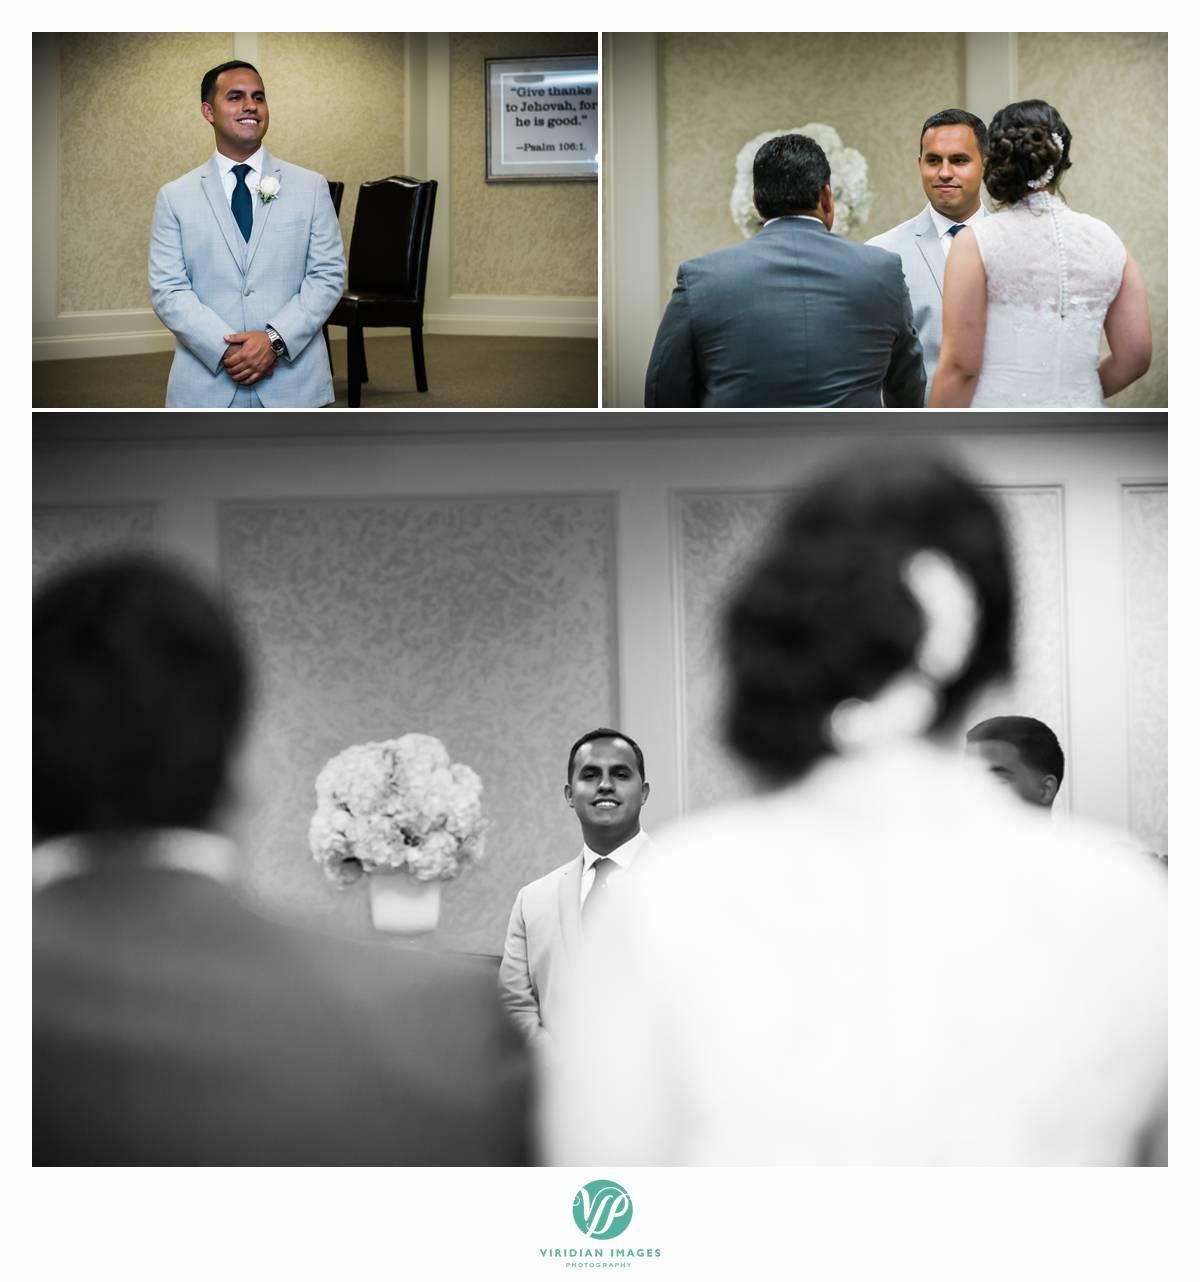 Hilton-Head-Callawassie-Club-Wedding-Viridian-Images-Photography-photo 15